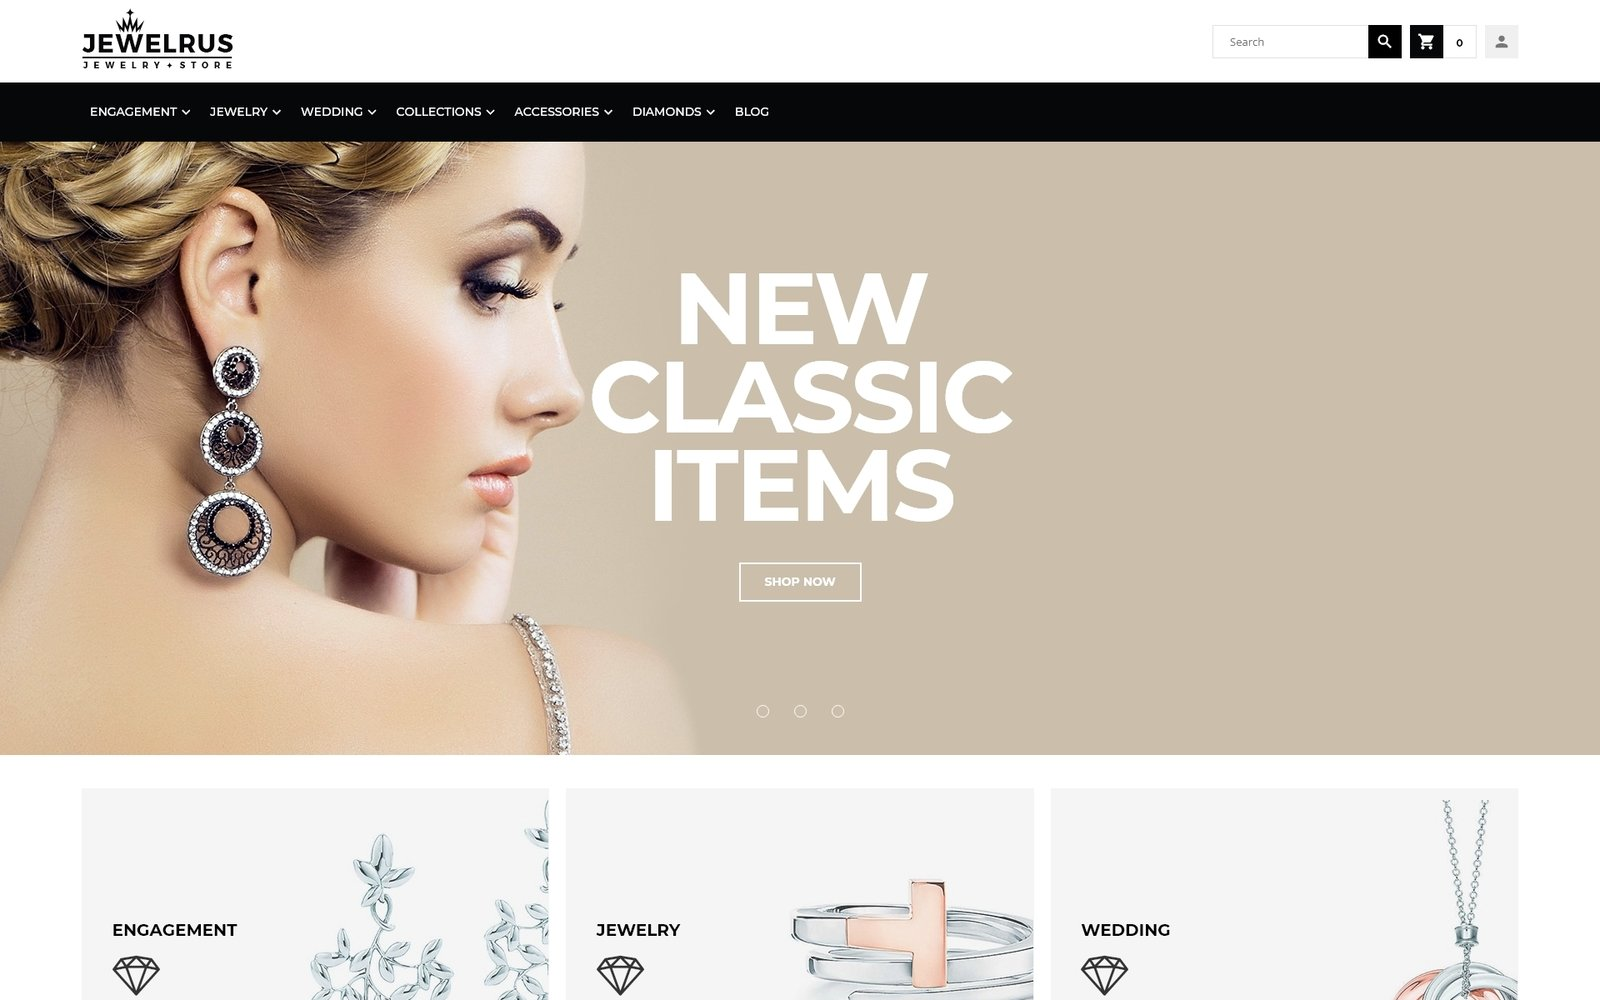 """Jewelrus - Jewelry Store"" 响应式Magento模板 #66100"